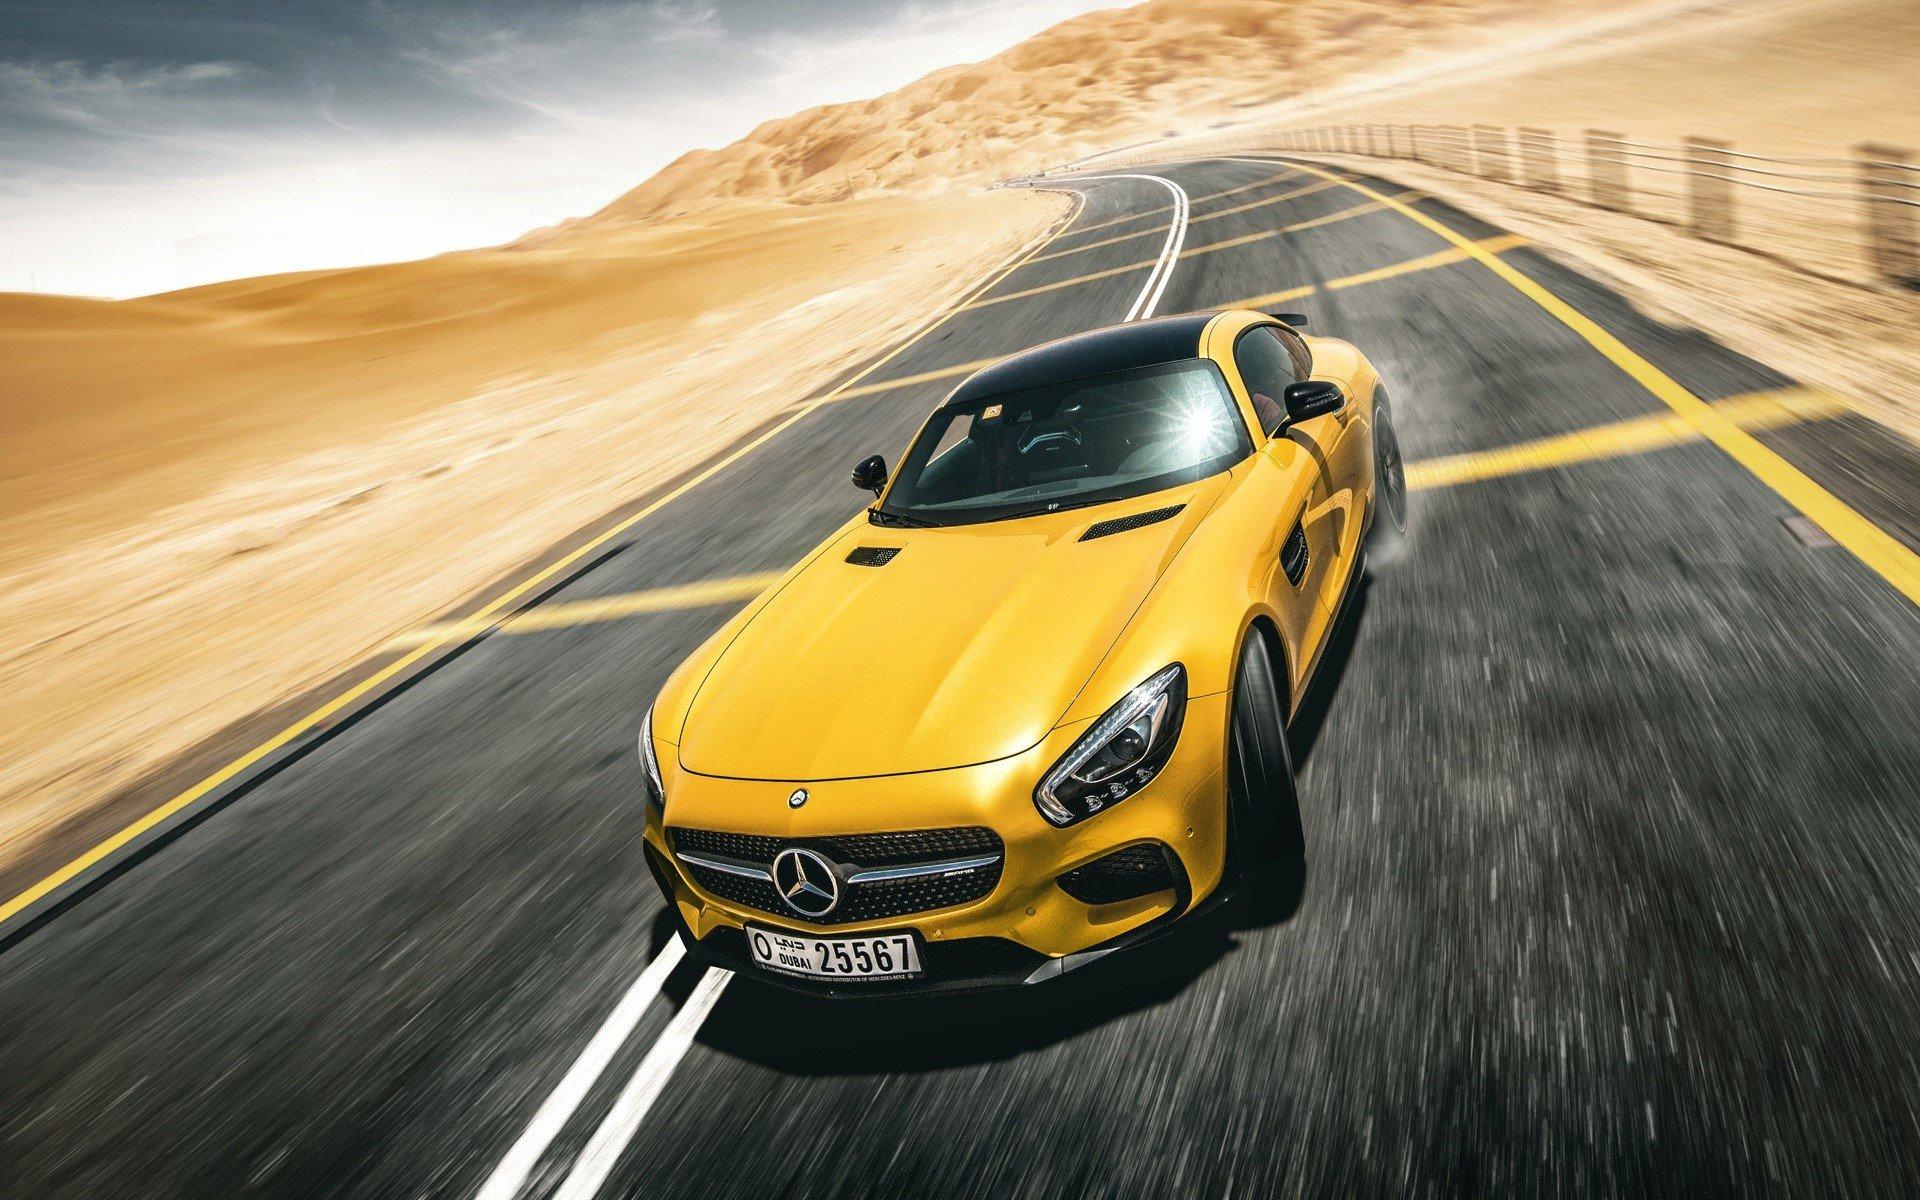 Fondo de pantalla de Mercedes Benz AMG GT S amarillo Imágenes